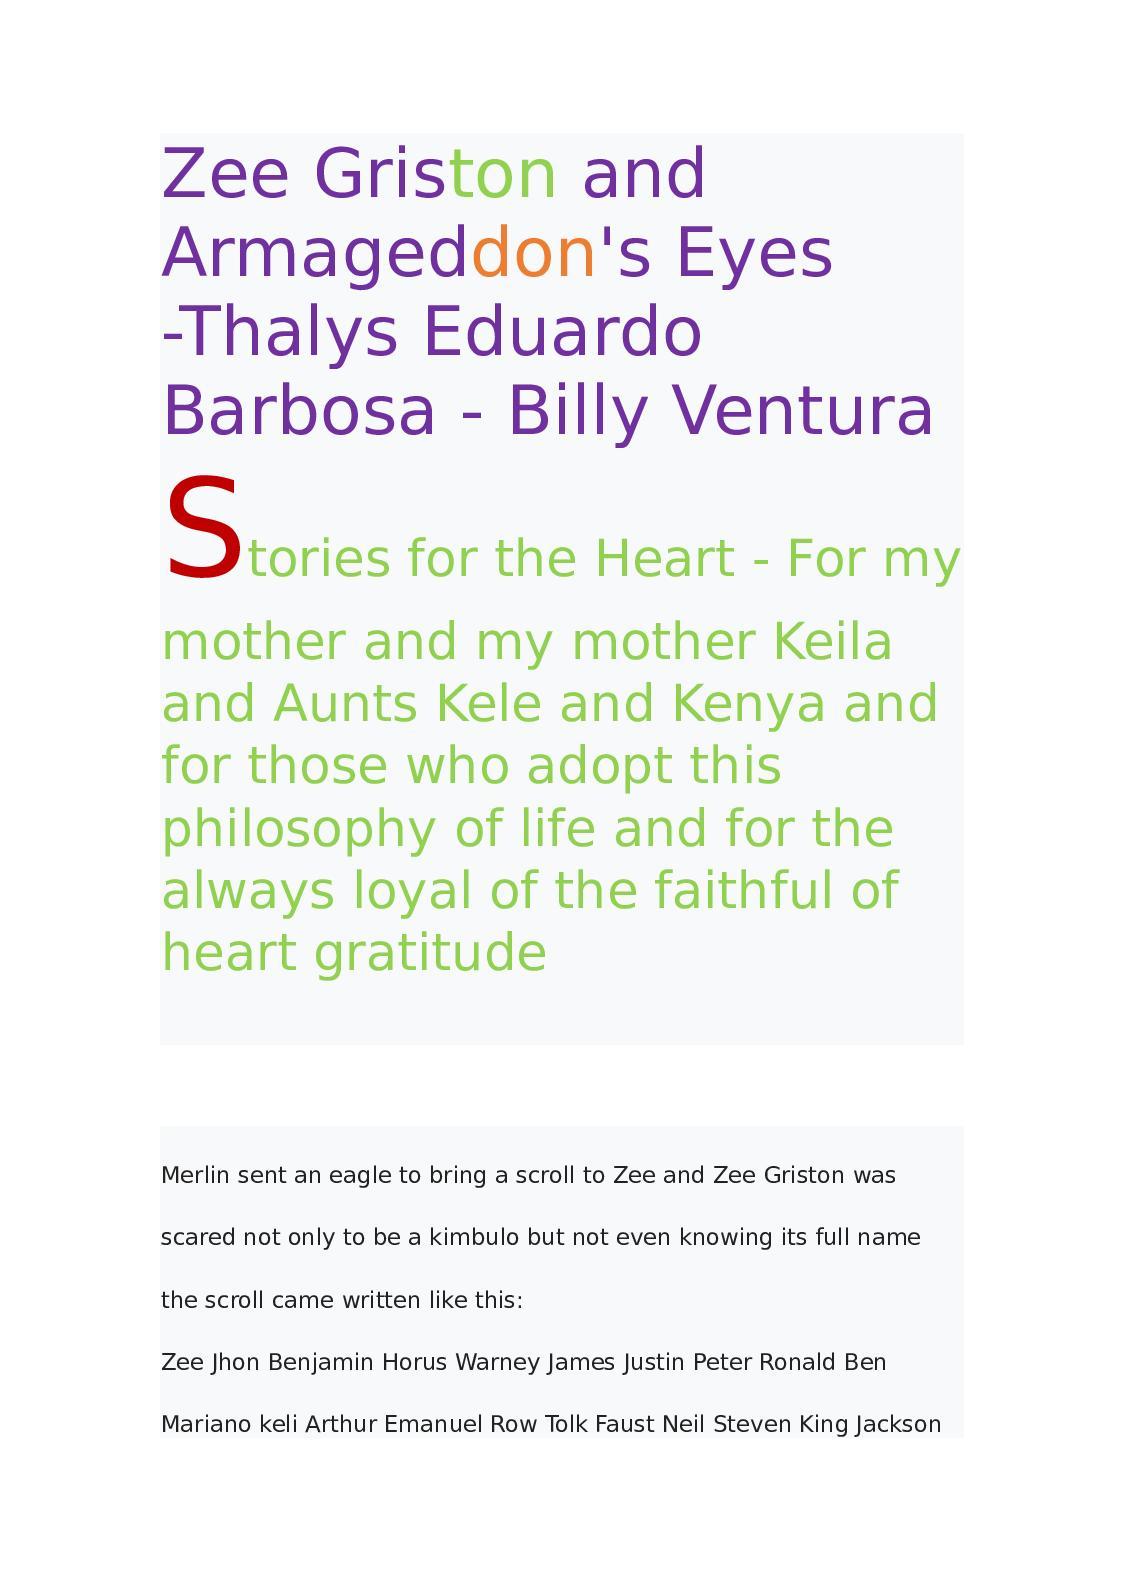 Calaméo - Livr Zee Griston and Armageddon's Eyes -Thalys